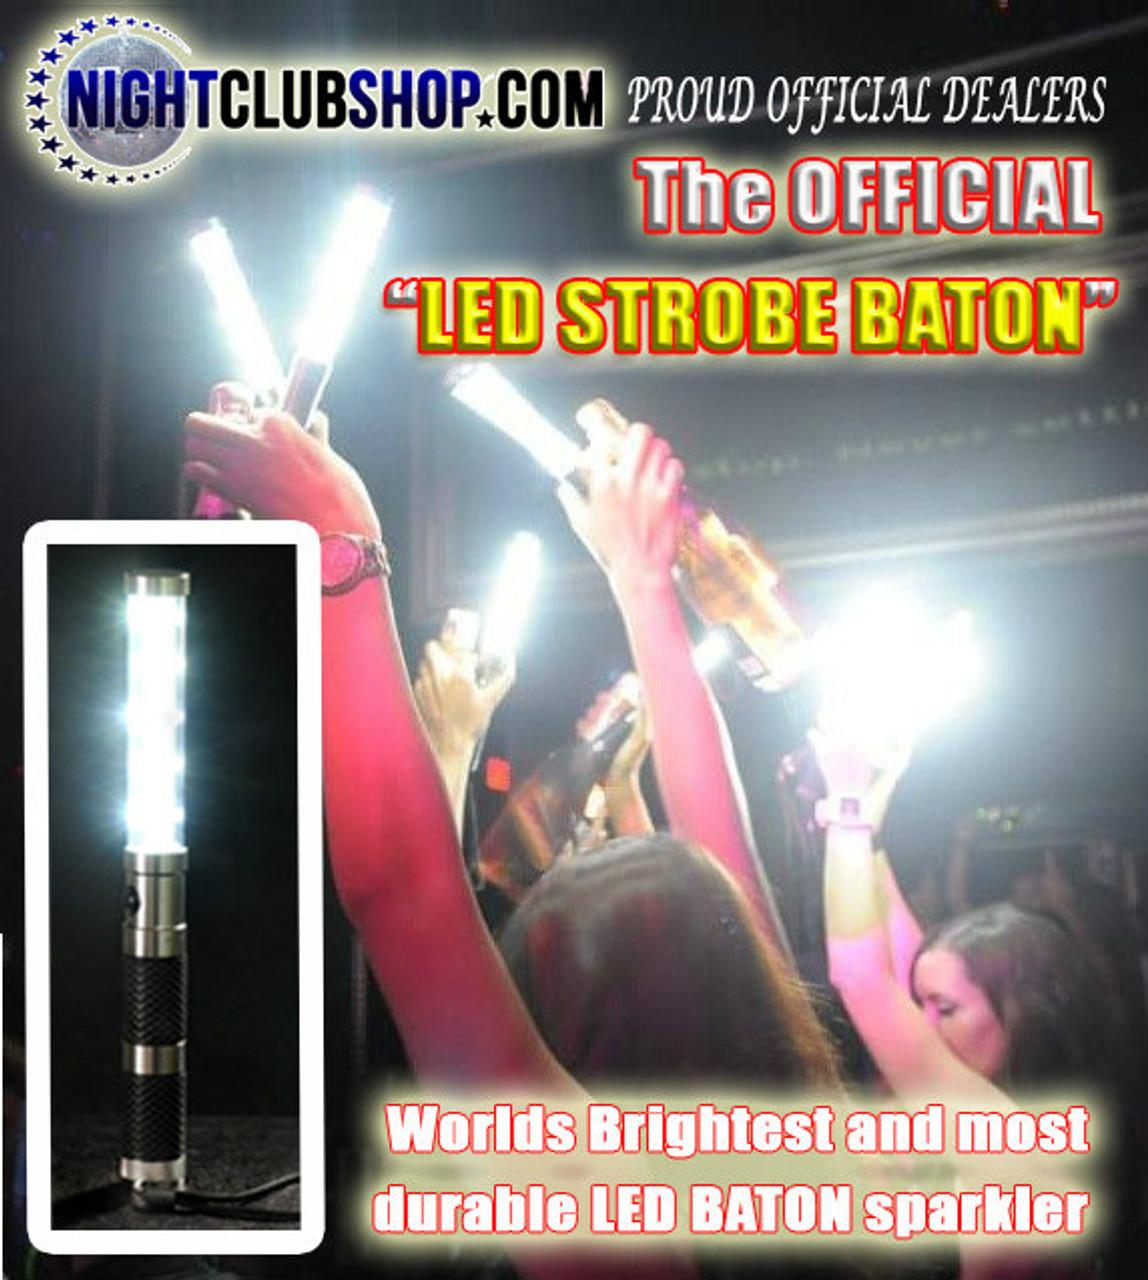 LED STROBE BATON, LED, STROBE, BATON, Electronic, flash, wand,bottle service, bottle delivery, alternative, sparkler, bottle sparkler